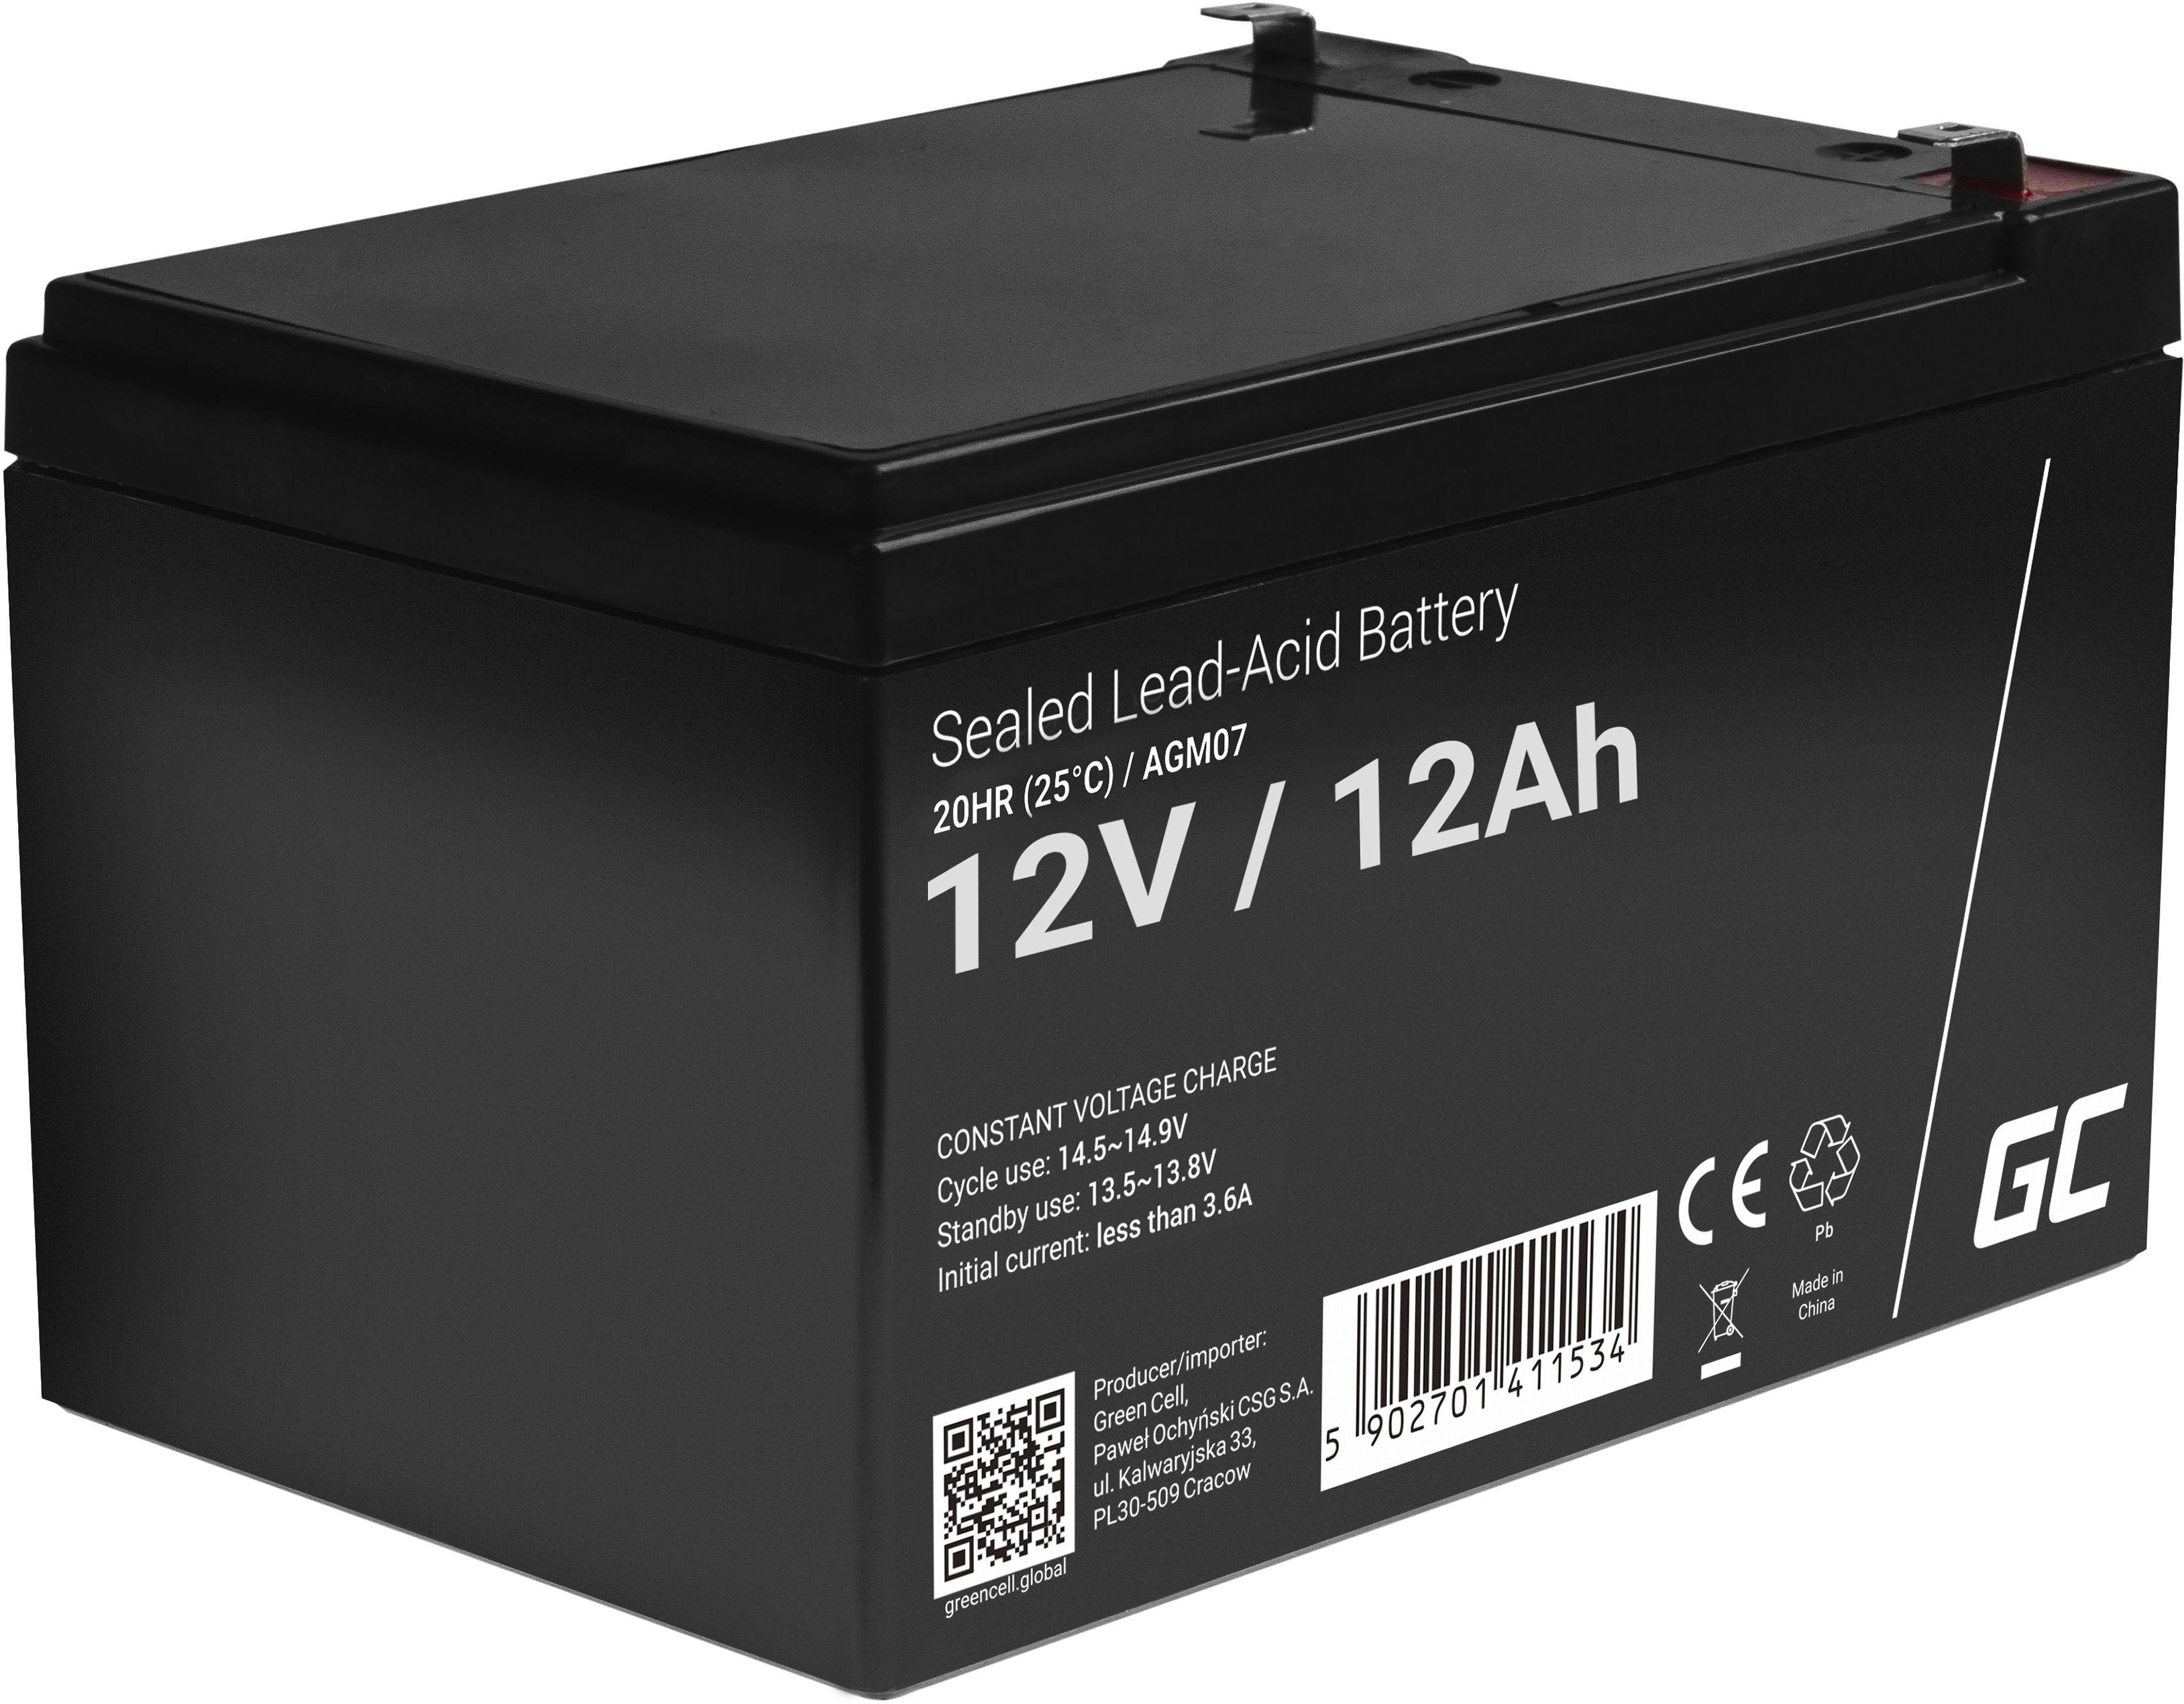 Green Cell AGM VRLA 12V 12Ah bezobsługowy akumulator do systemu alarmowego kasy fiskalnej zabawki